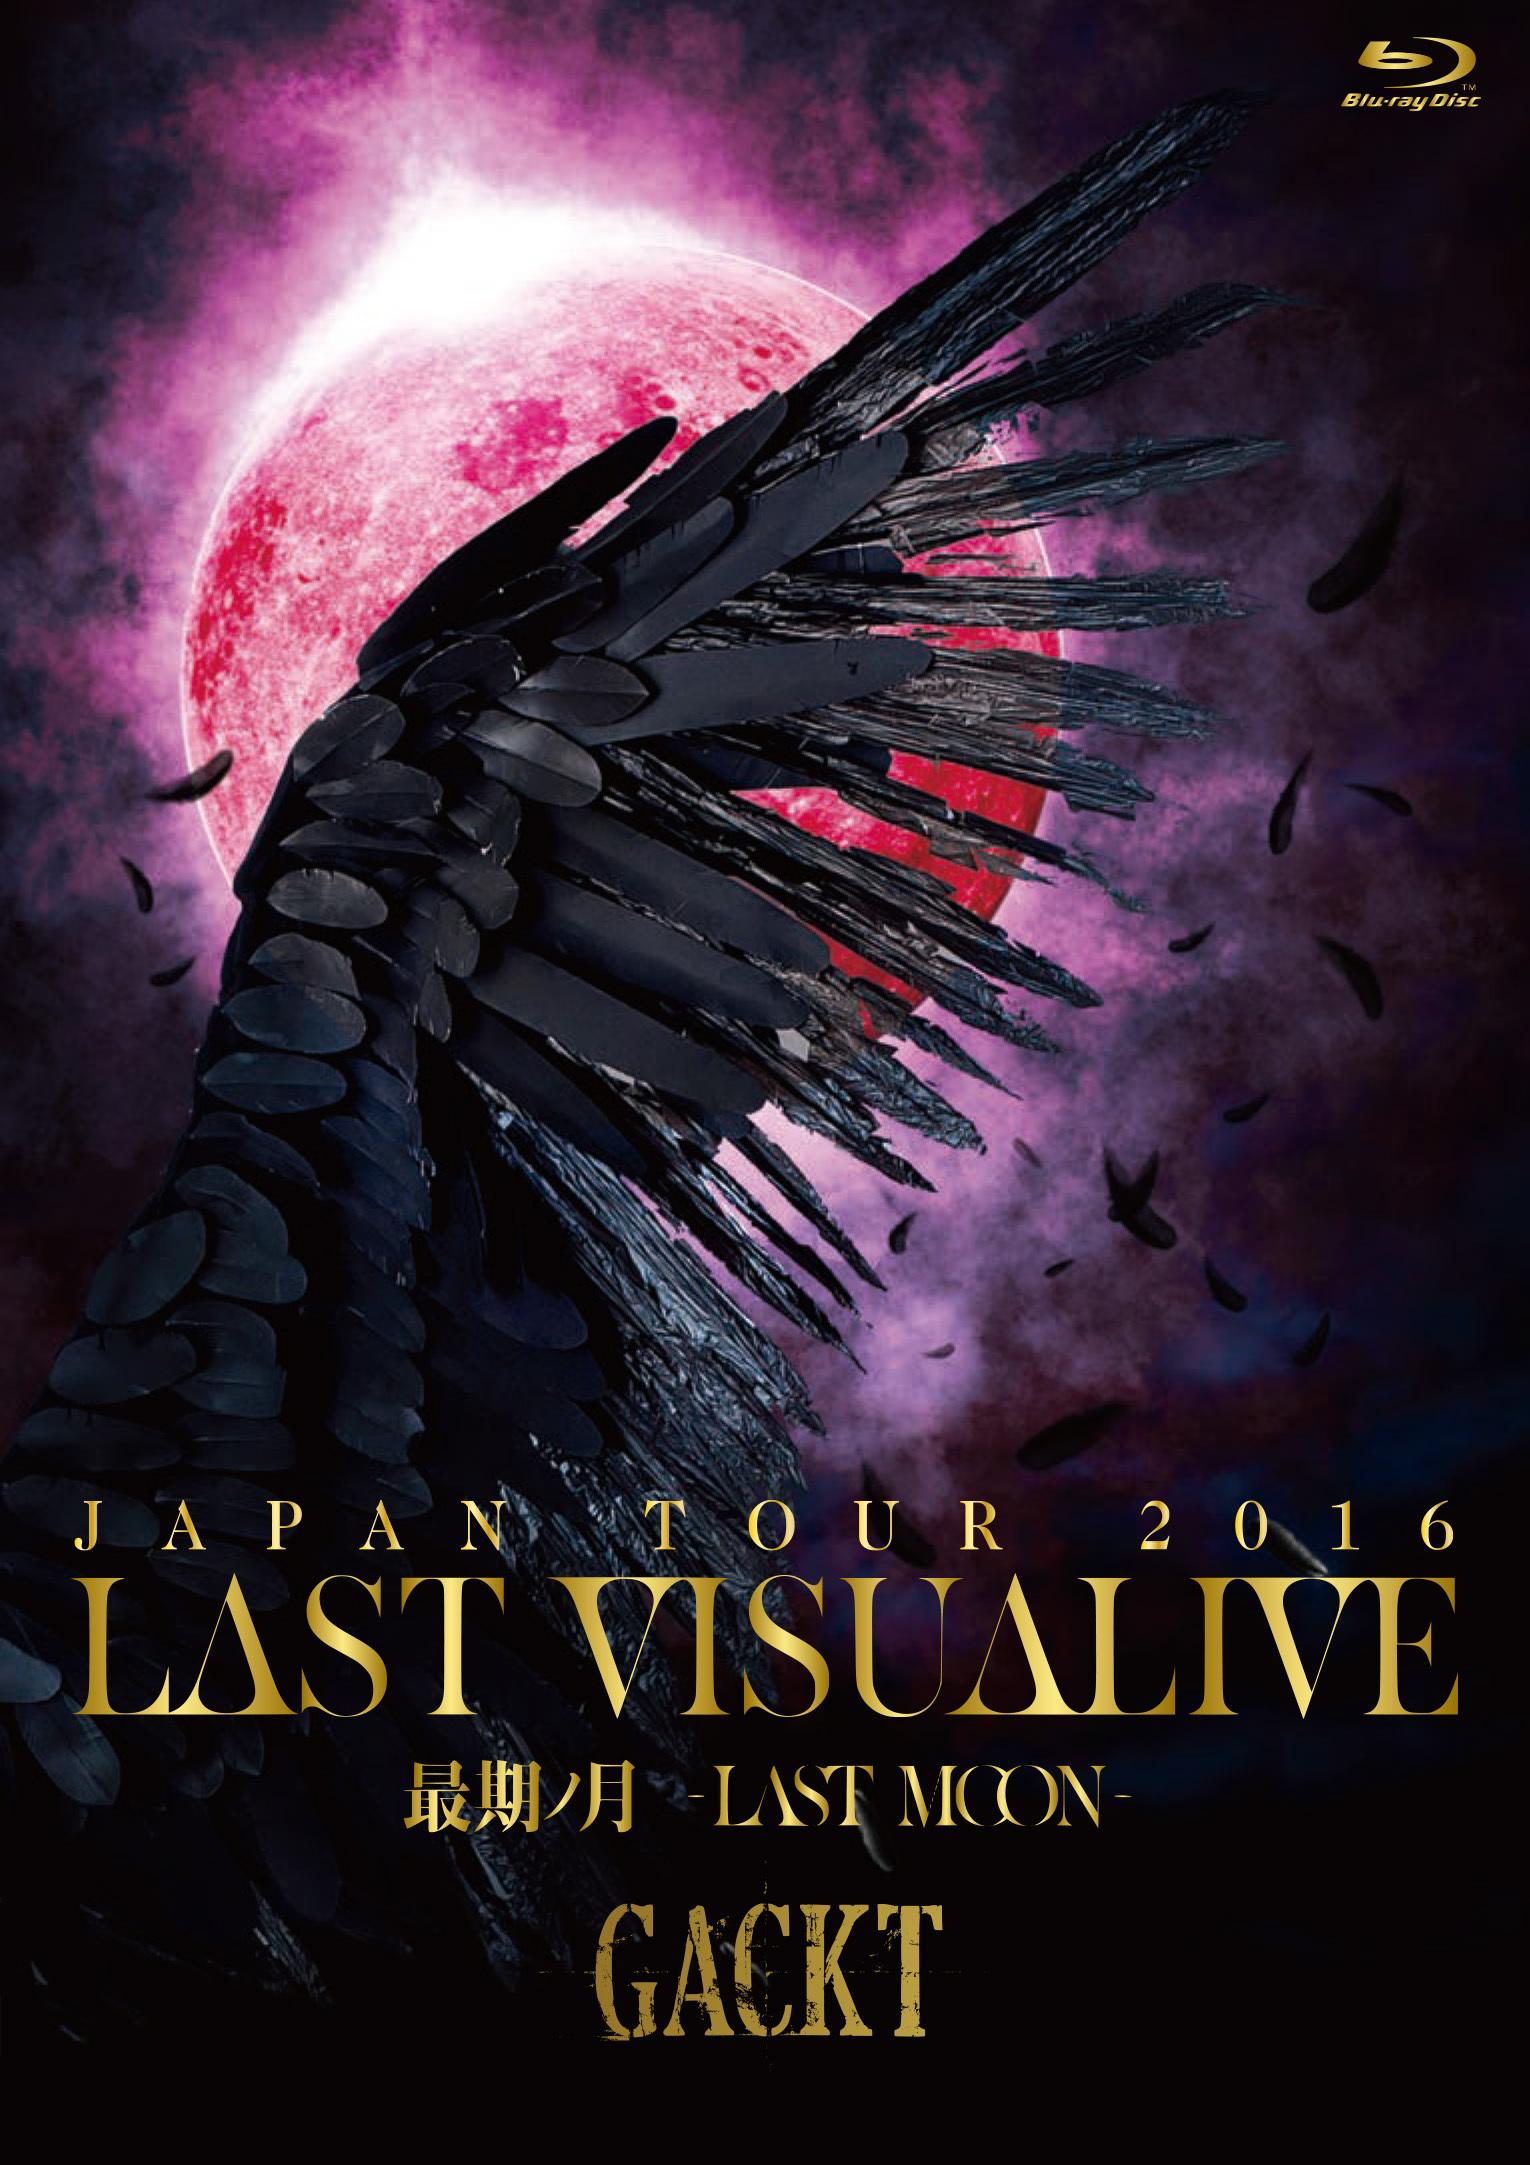 Gackt_japan_tuor_2016_last_visualive_%e6%9c%80%e6%9c%9f%e3%83%8e%e6%9c%88_-last_moon-__%e9%80%9a%e5%b8%b8%e7%9b%a4___blu-ray_